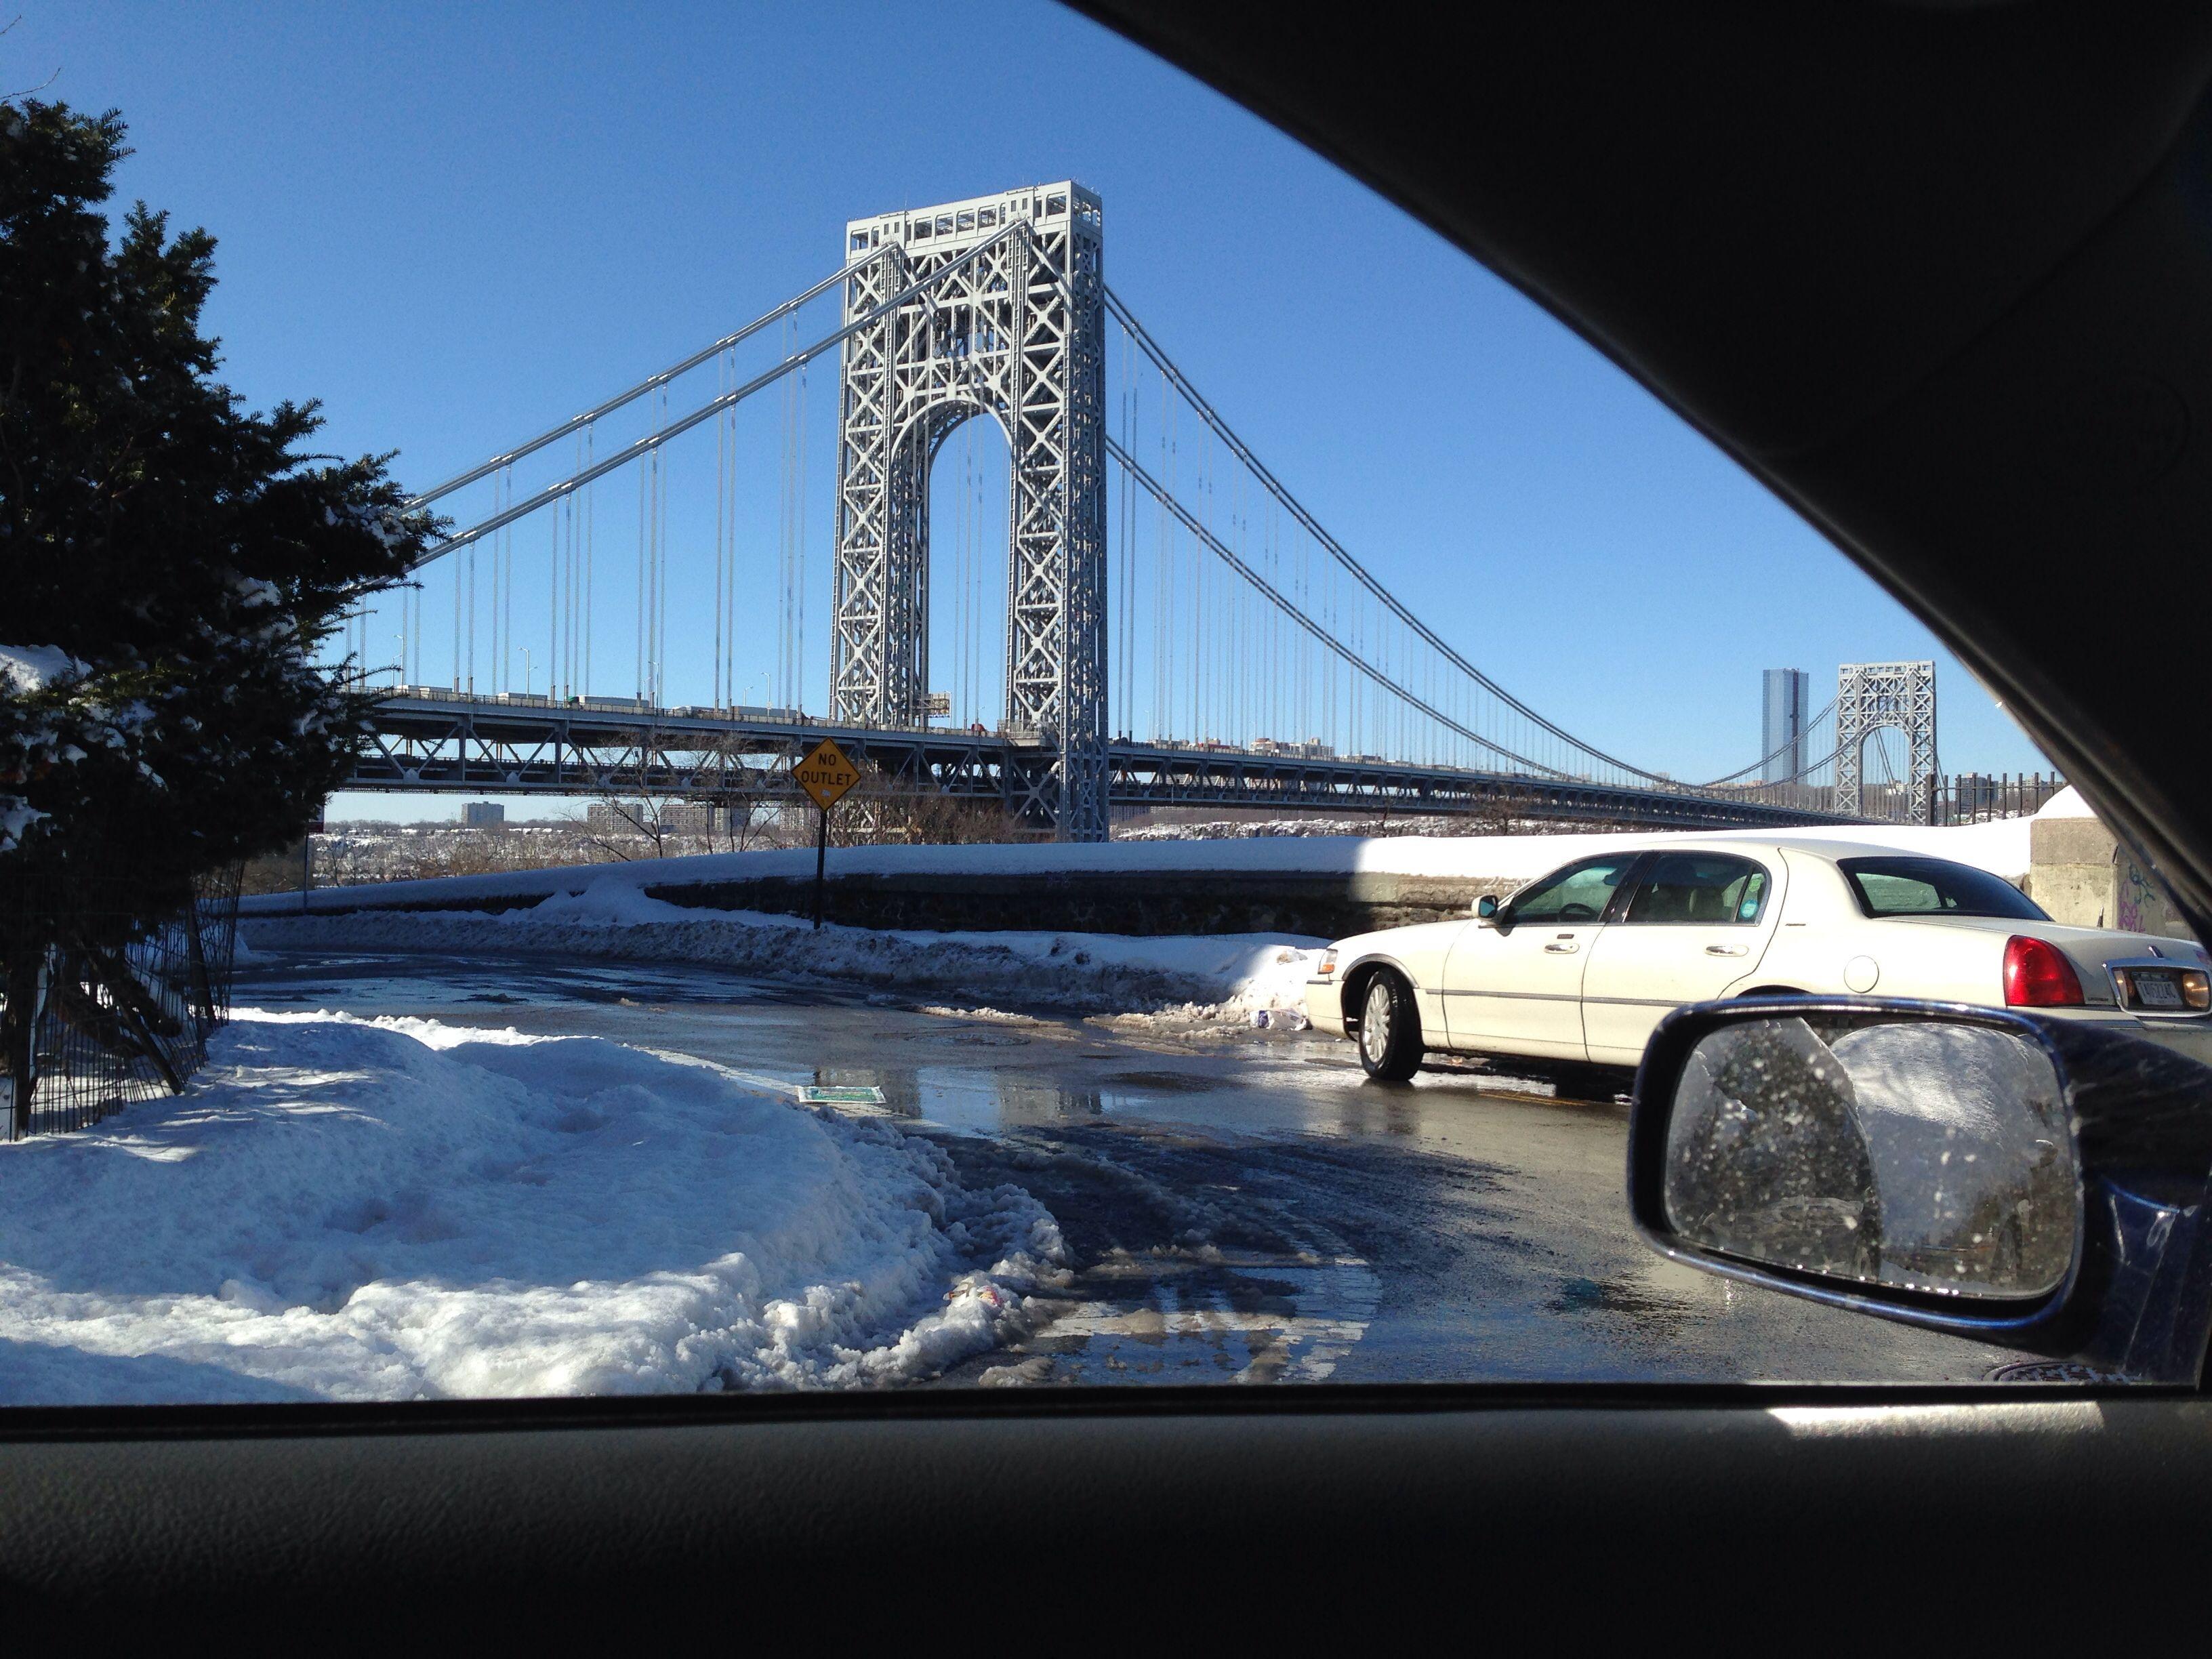 GW bridge snow on valentines day 2014/NYC/Washington Heights